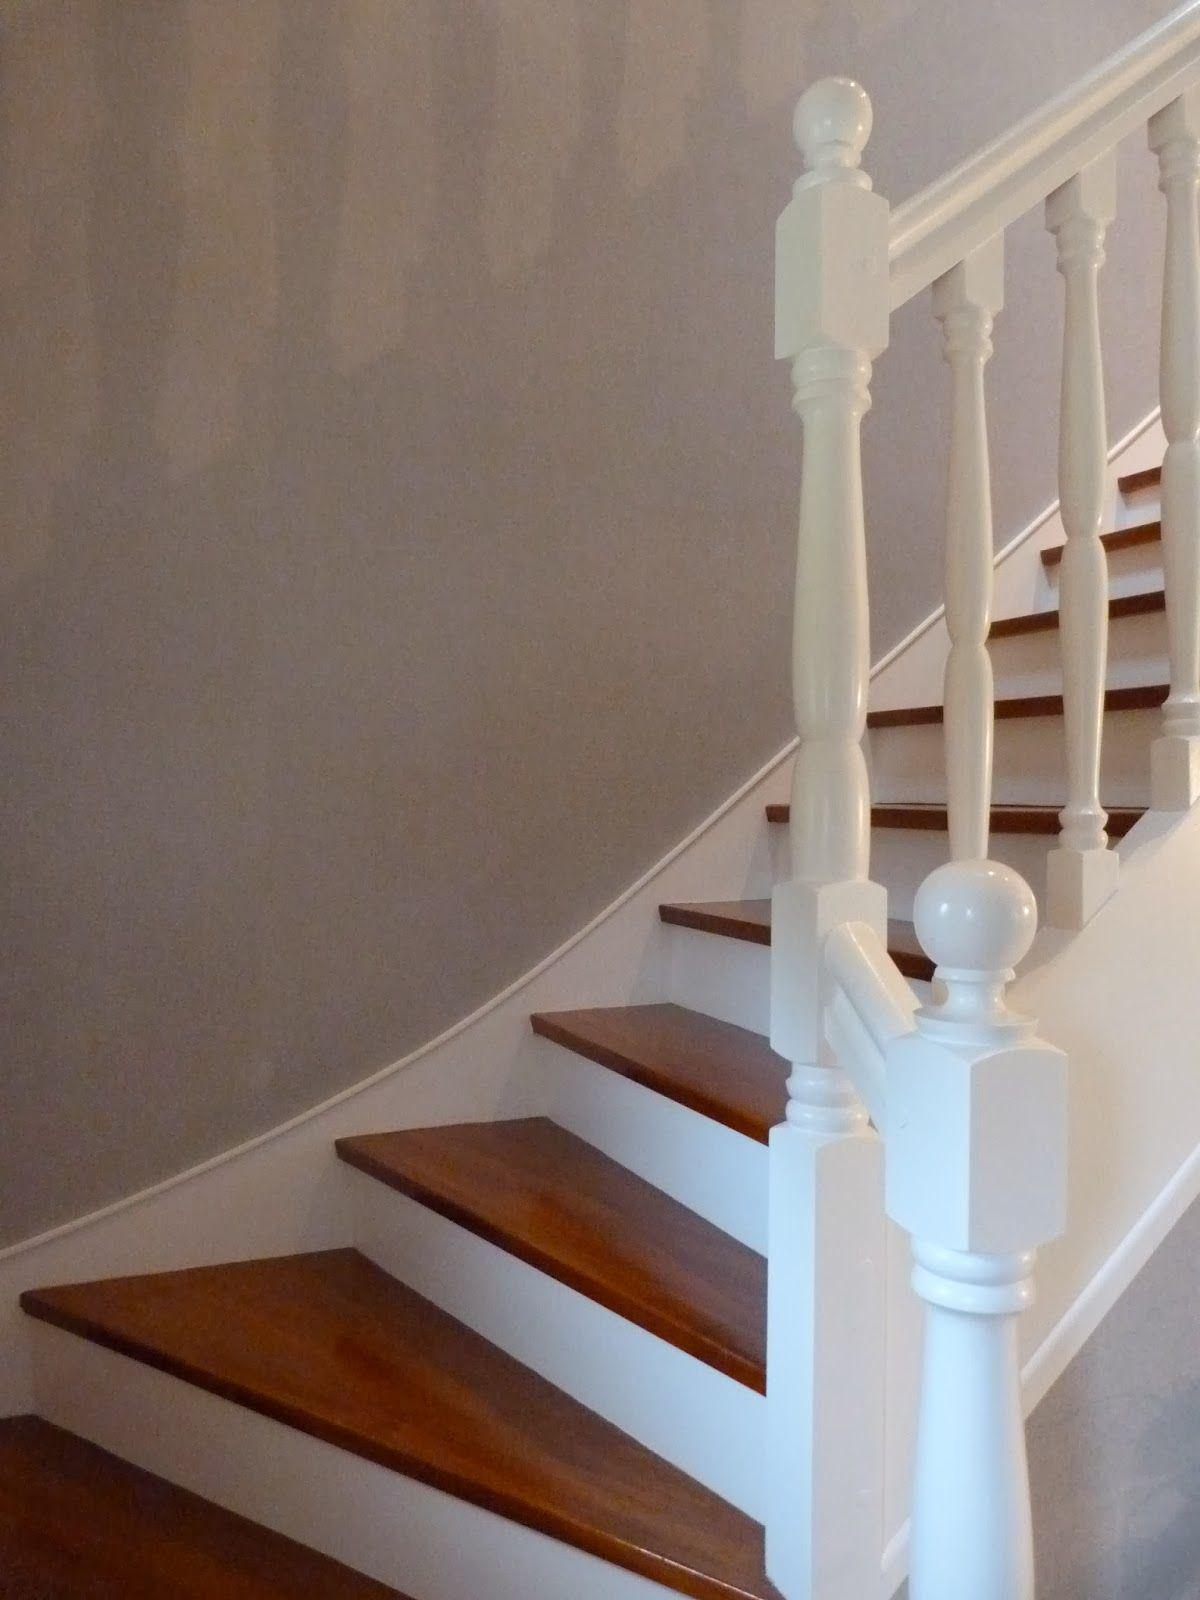 Anthracite Deco Renovation D Escalier Idee Deco Escalier Peinture Escalier Escalier Bois